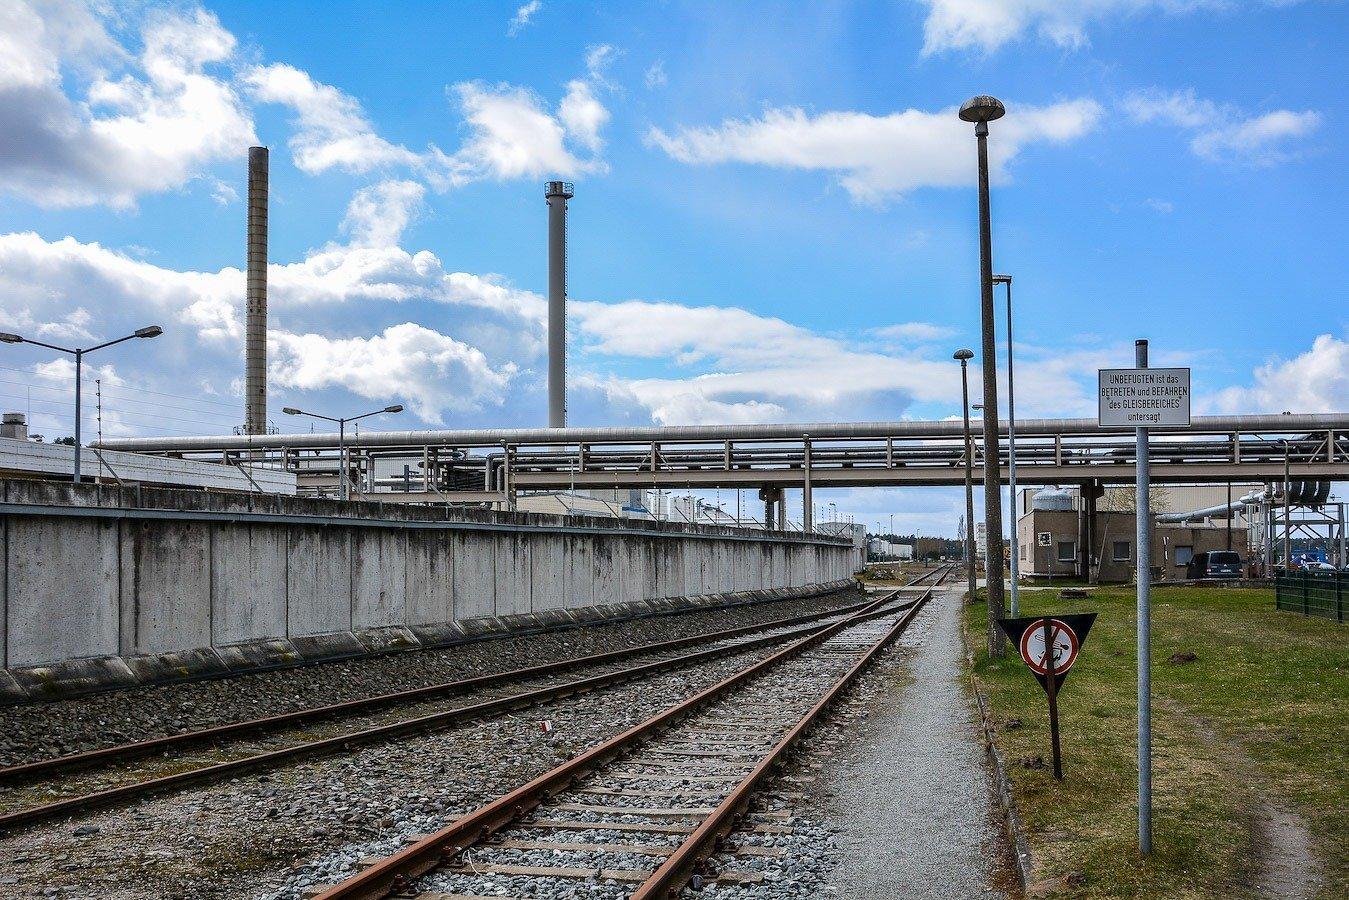 bahngleise train tracks kernkraftwerk greifswald nuclear powerplant ost deutschland east germany gdr DDR mecklenburg vorpommern.jpg